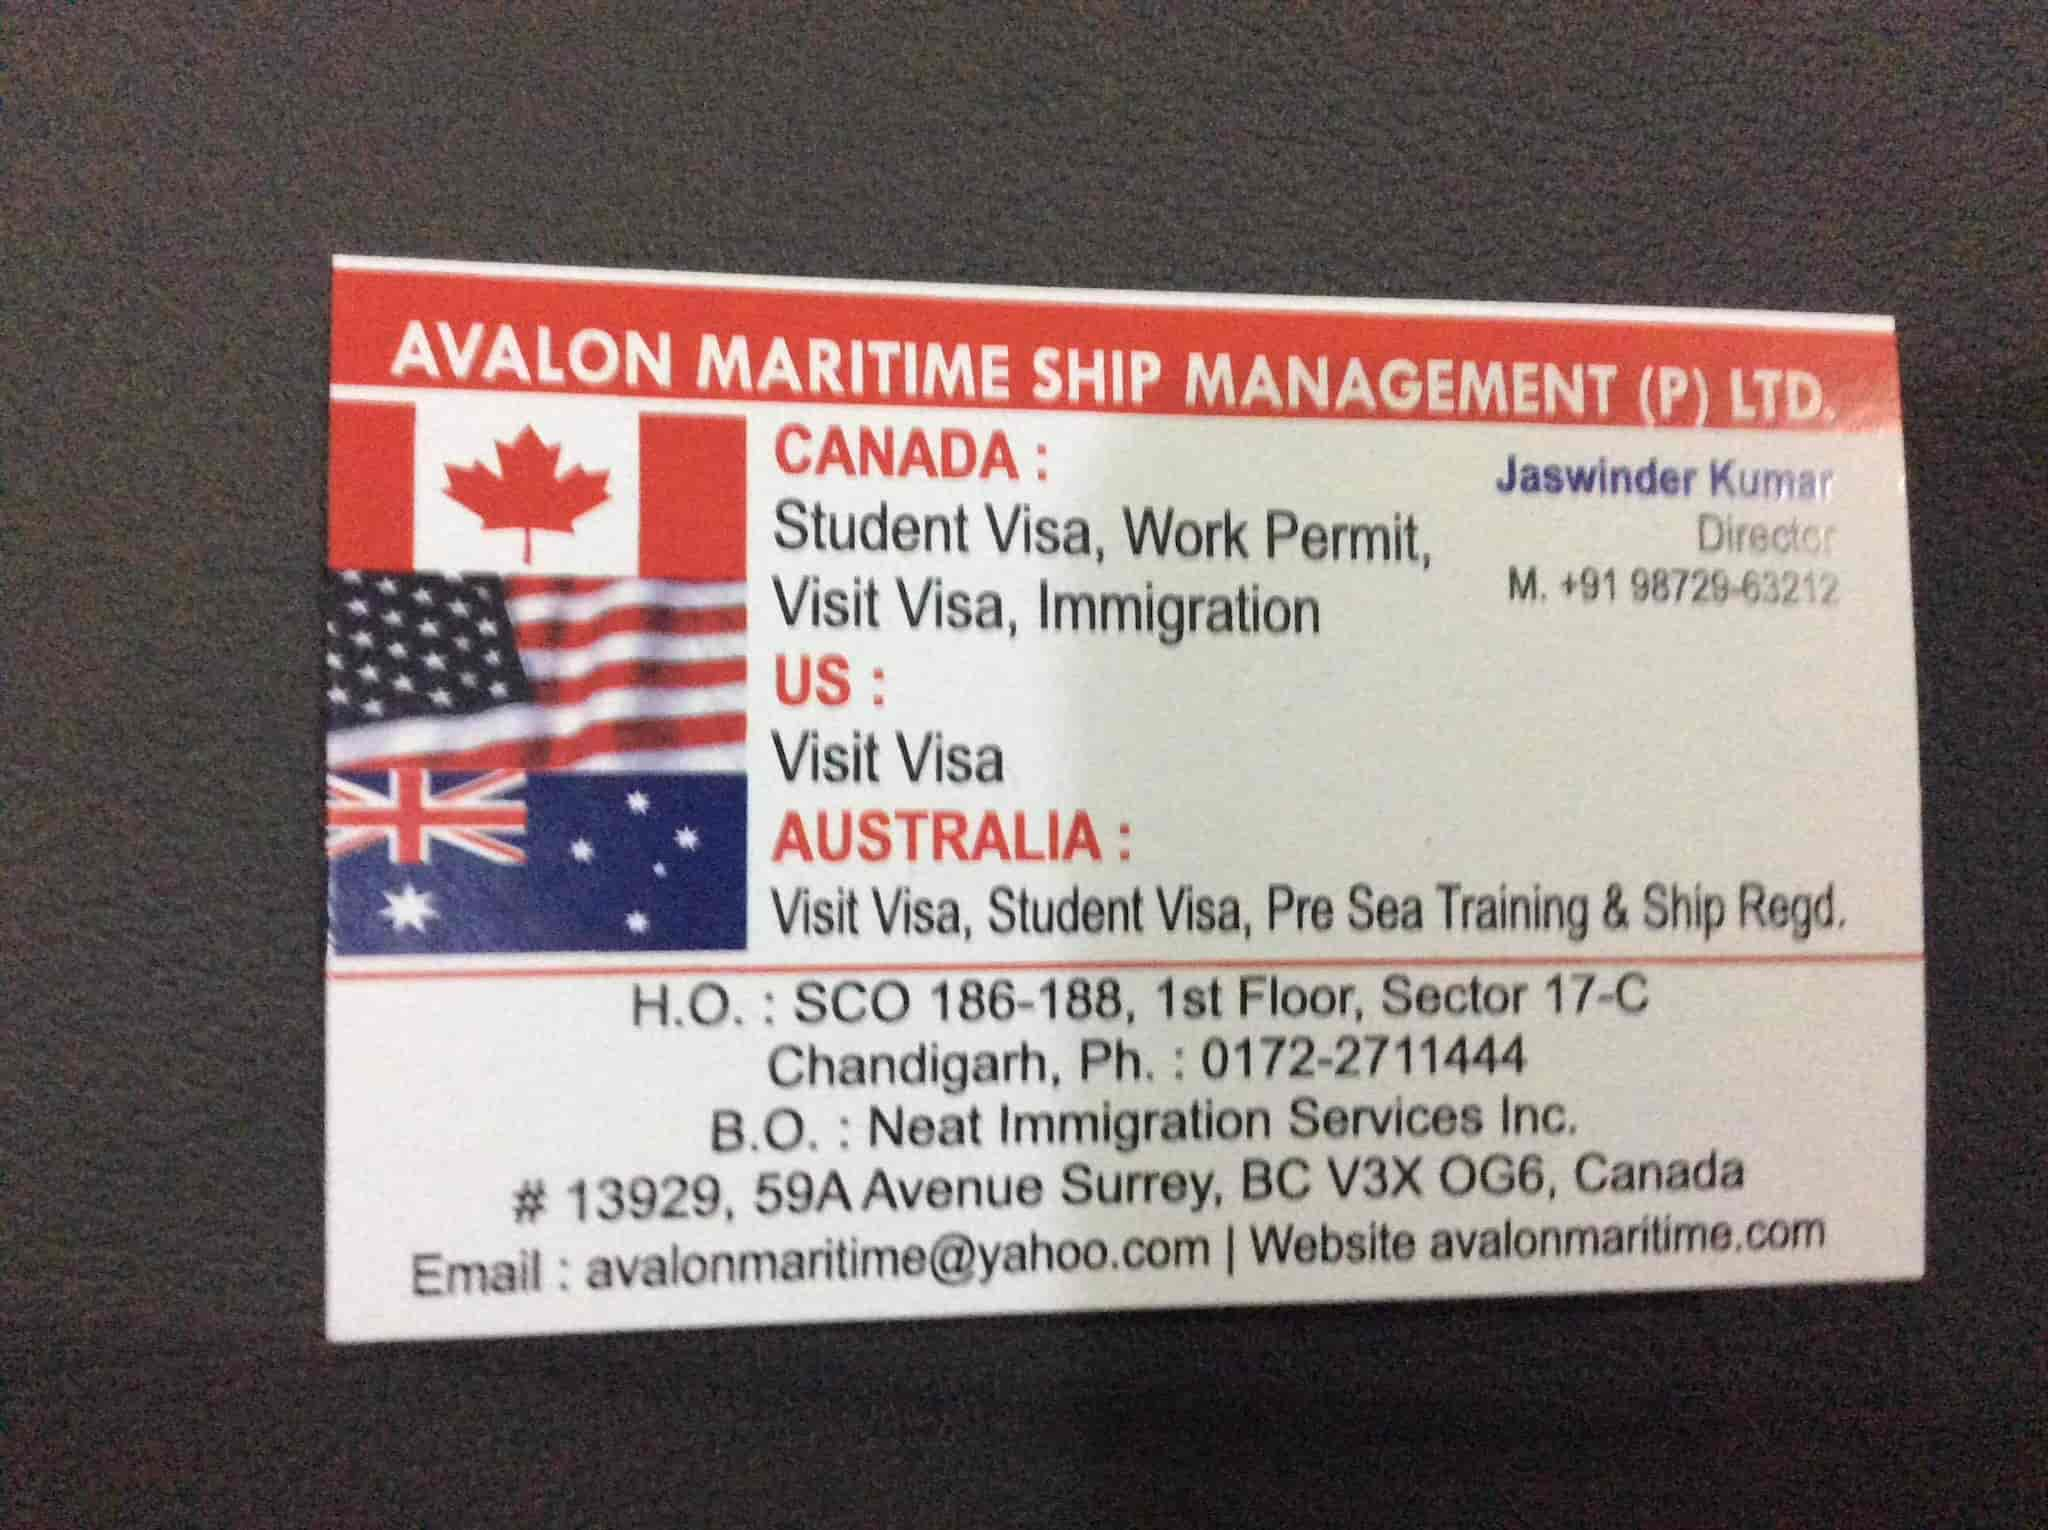 Avalon Maritime Ship Management Photos Sector 17c Chandigarh Merchant Navy Consultants